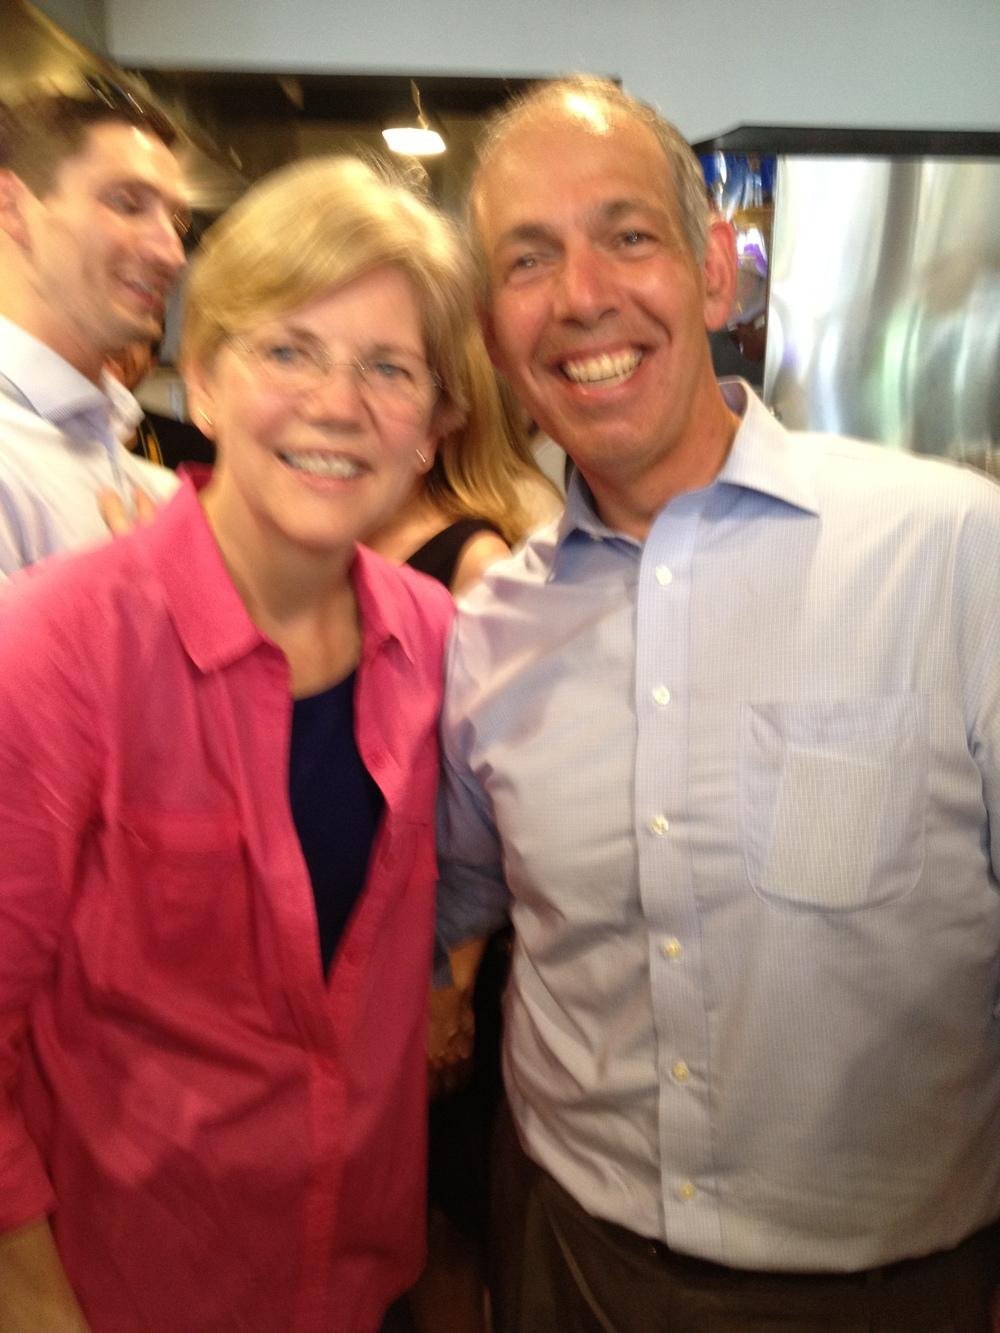 Charles with U.S. Senator Elizabeth Warren